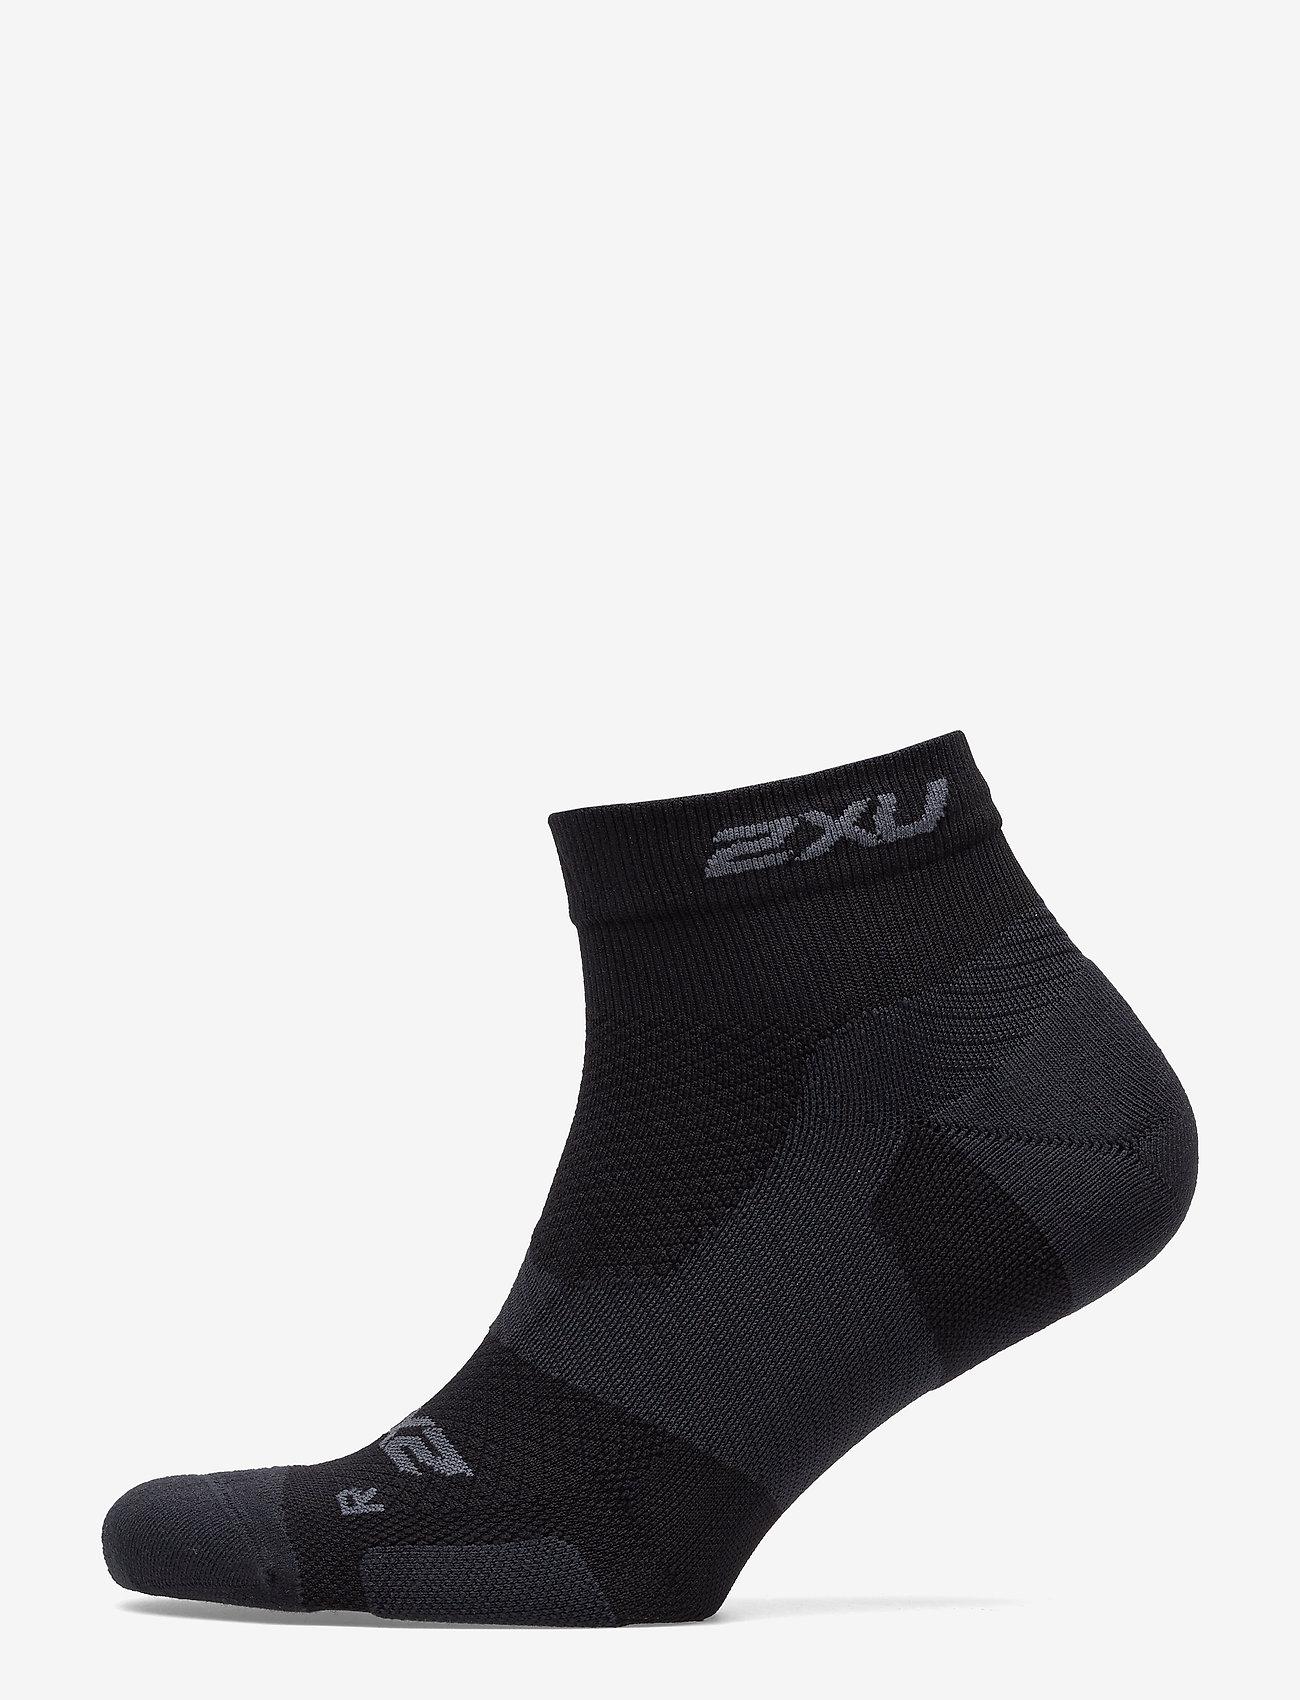 2xu Vectr Lightcush 1/4crew Sock-u - Strumpor & Tights Black/titanium